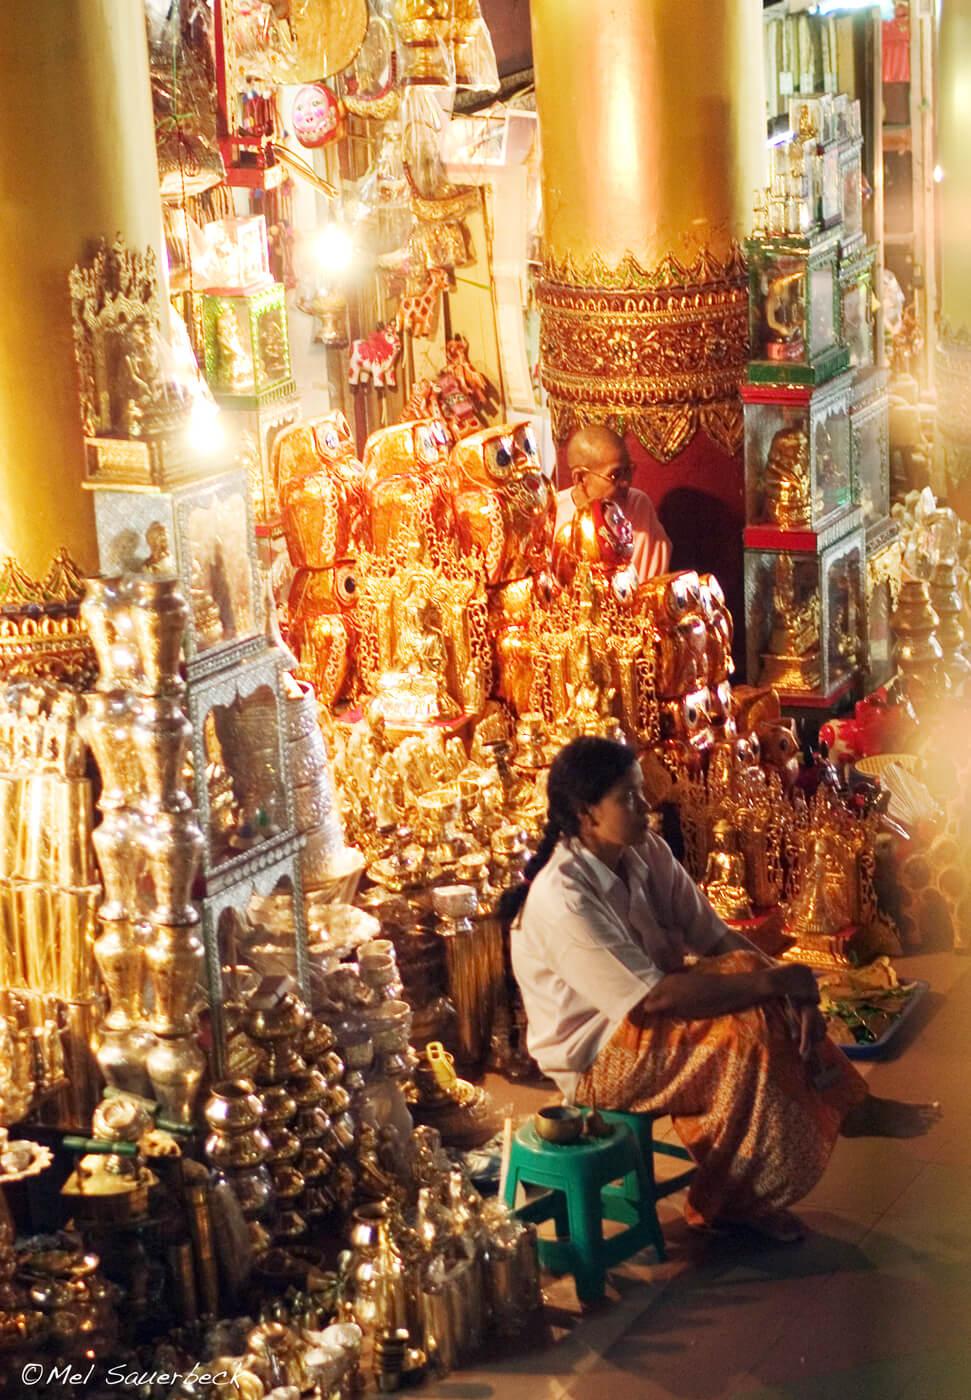 Woman in temple, Myanmar, Burma